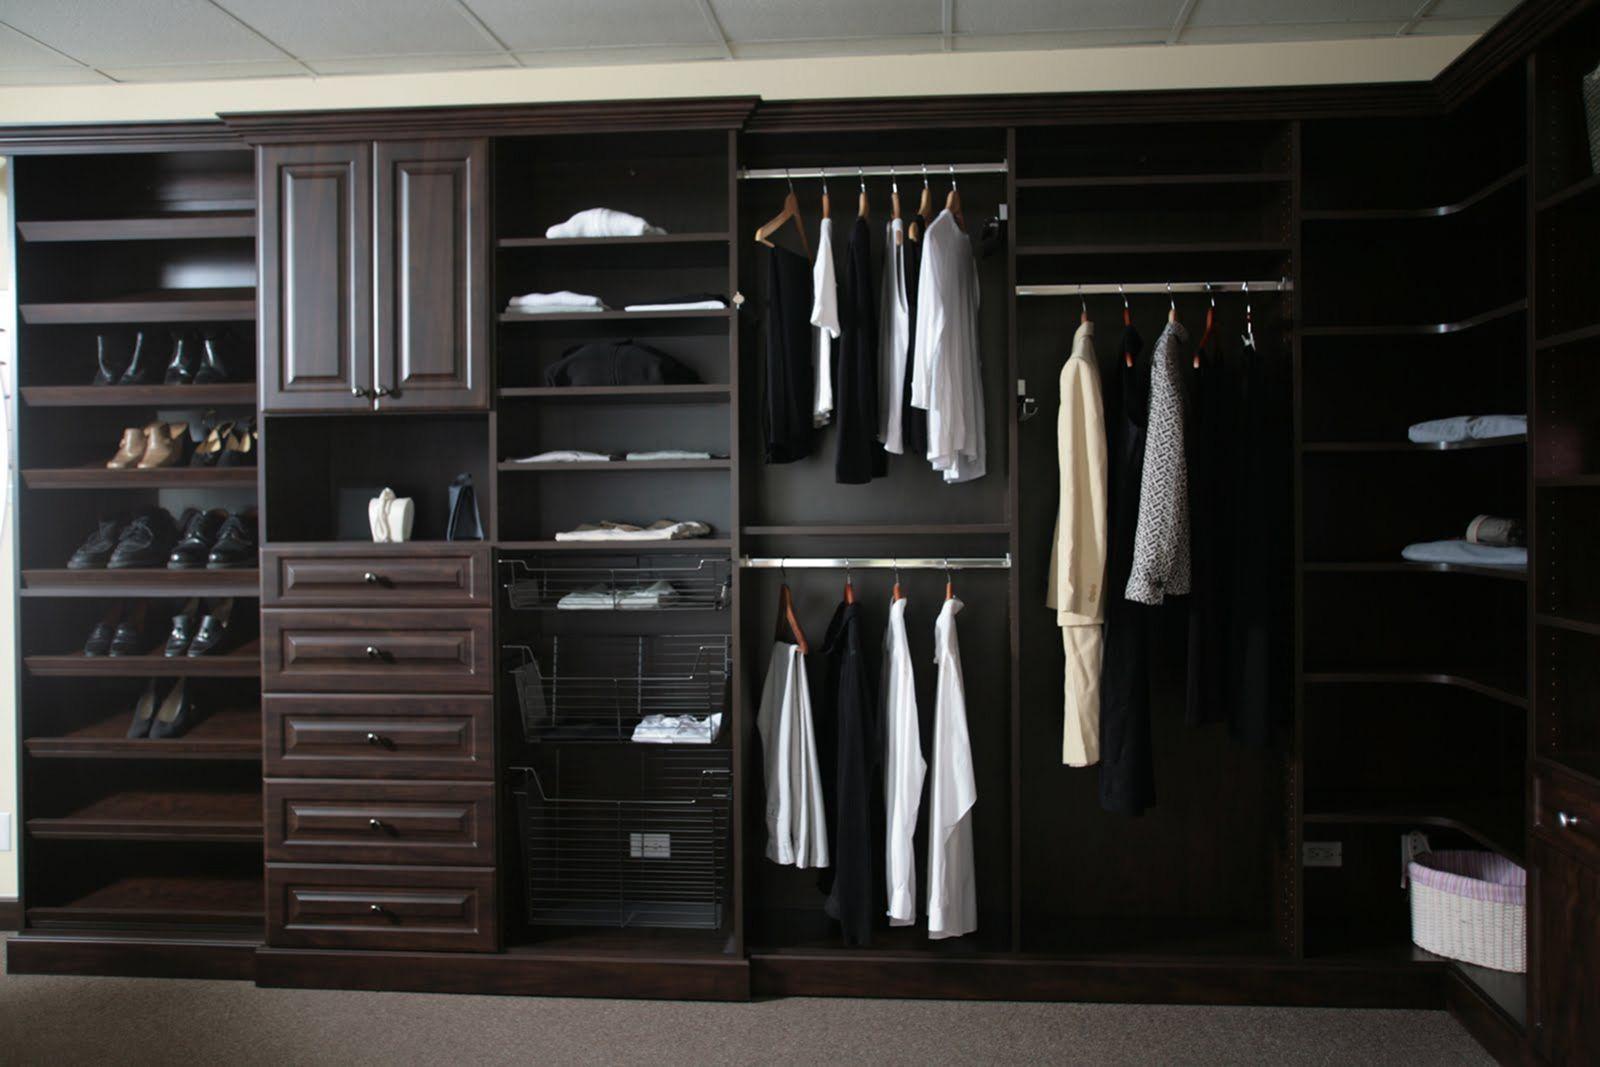 10 Excellent Black Wardrobe Design For Bedroom Ideas Closet Shelving Design Closet Decor Wooden Wardrobe Closet